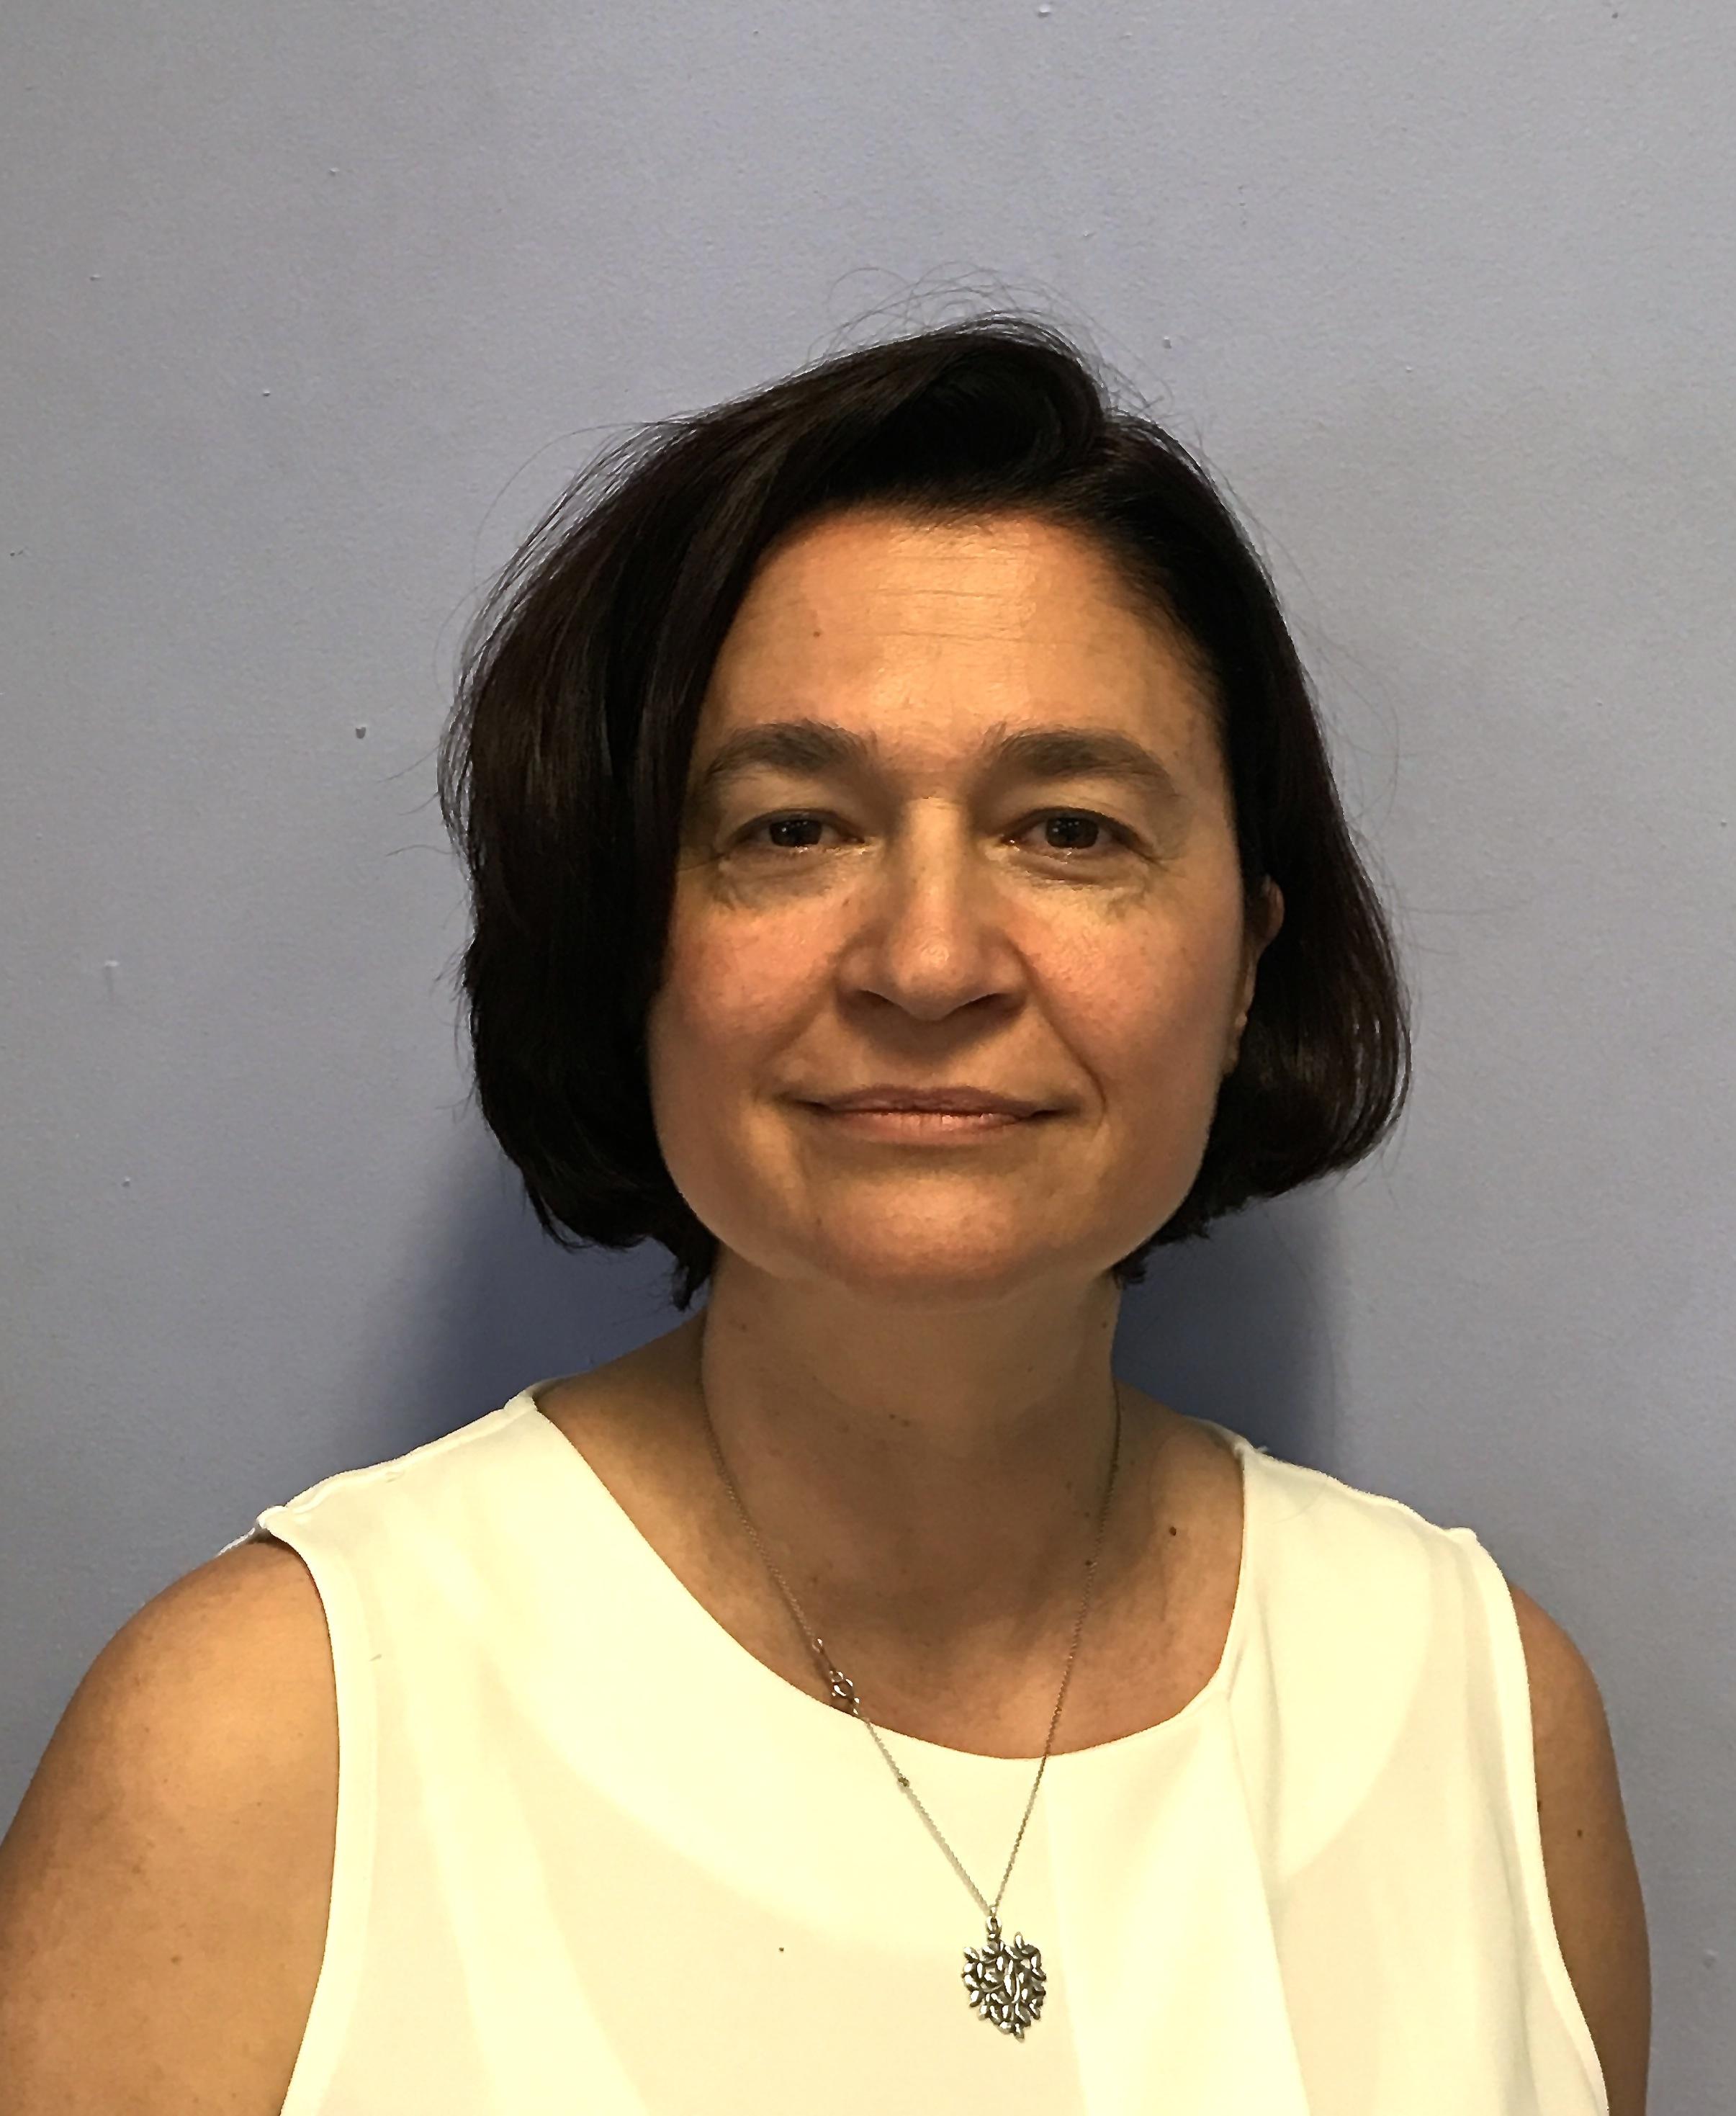 Assistant Professor - Columbia University